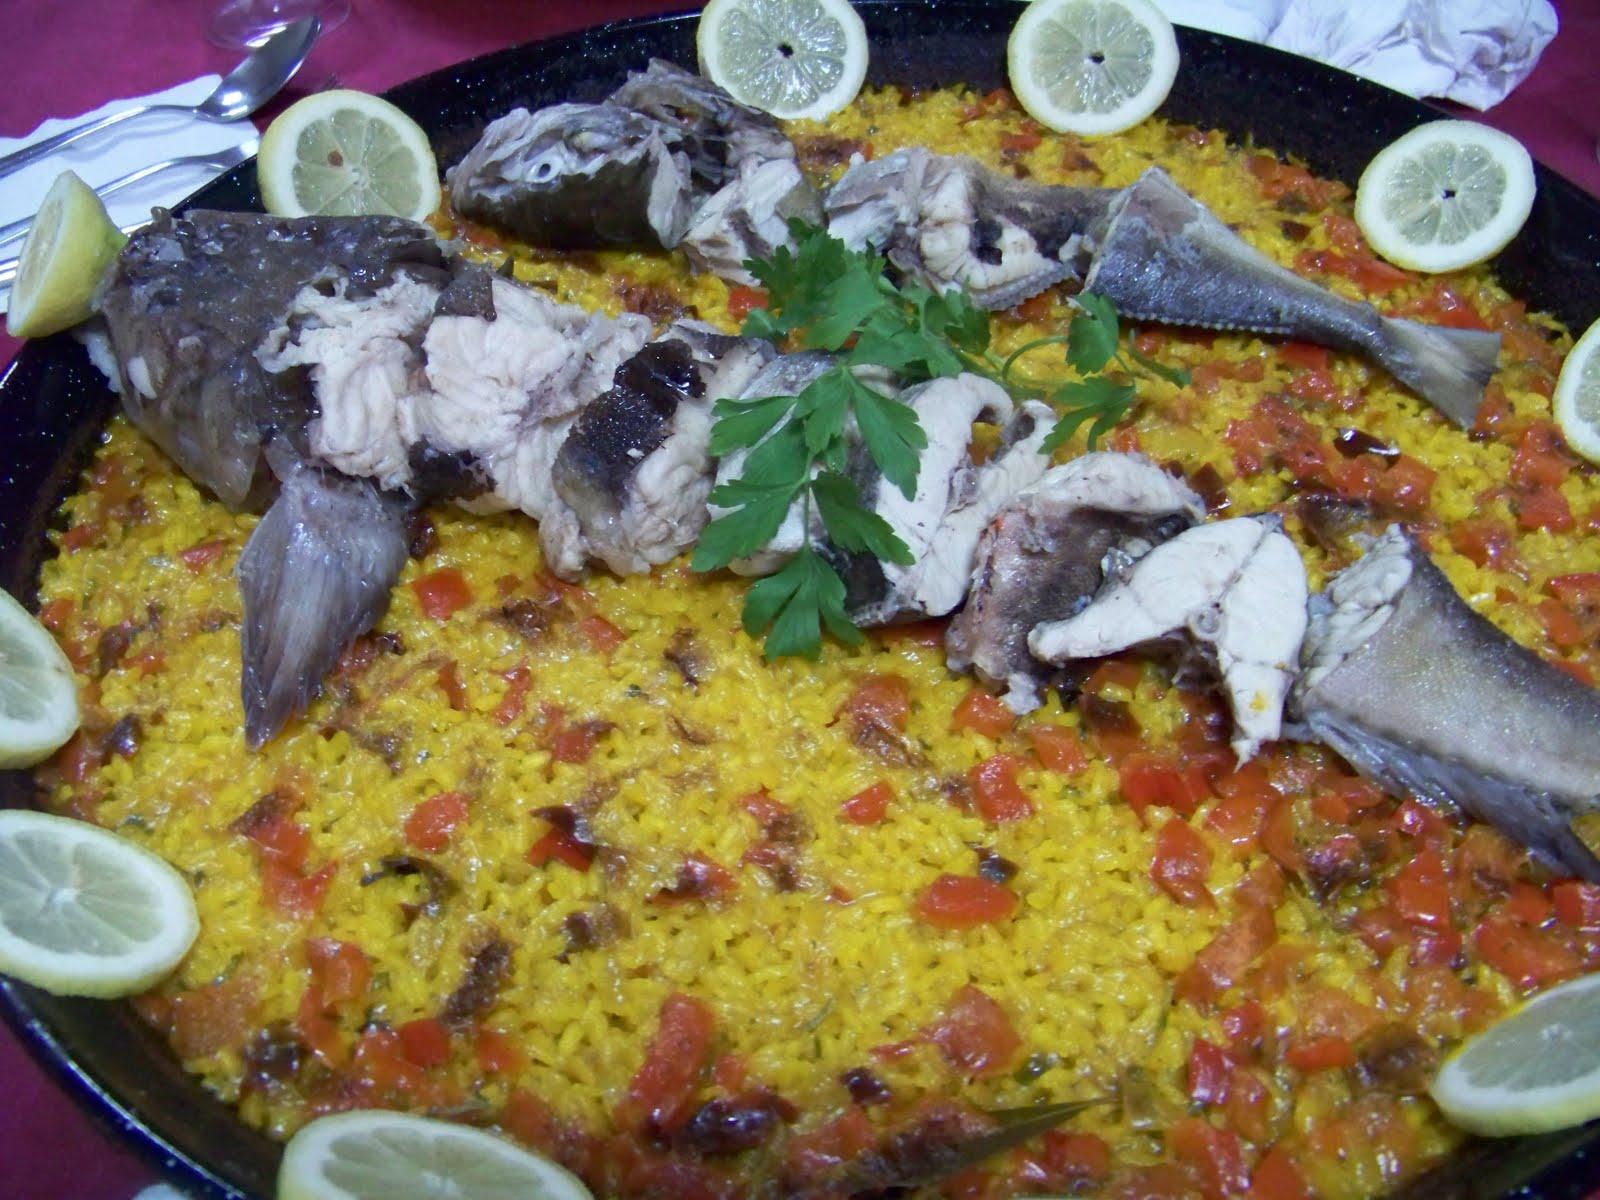 Taller de empleo garrucha restauraci n y turismo arroz - Trabajo en garrucha ...